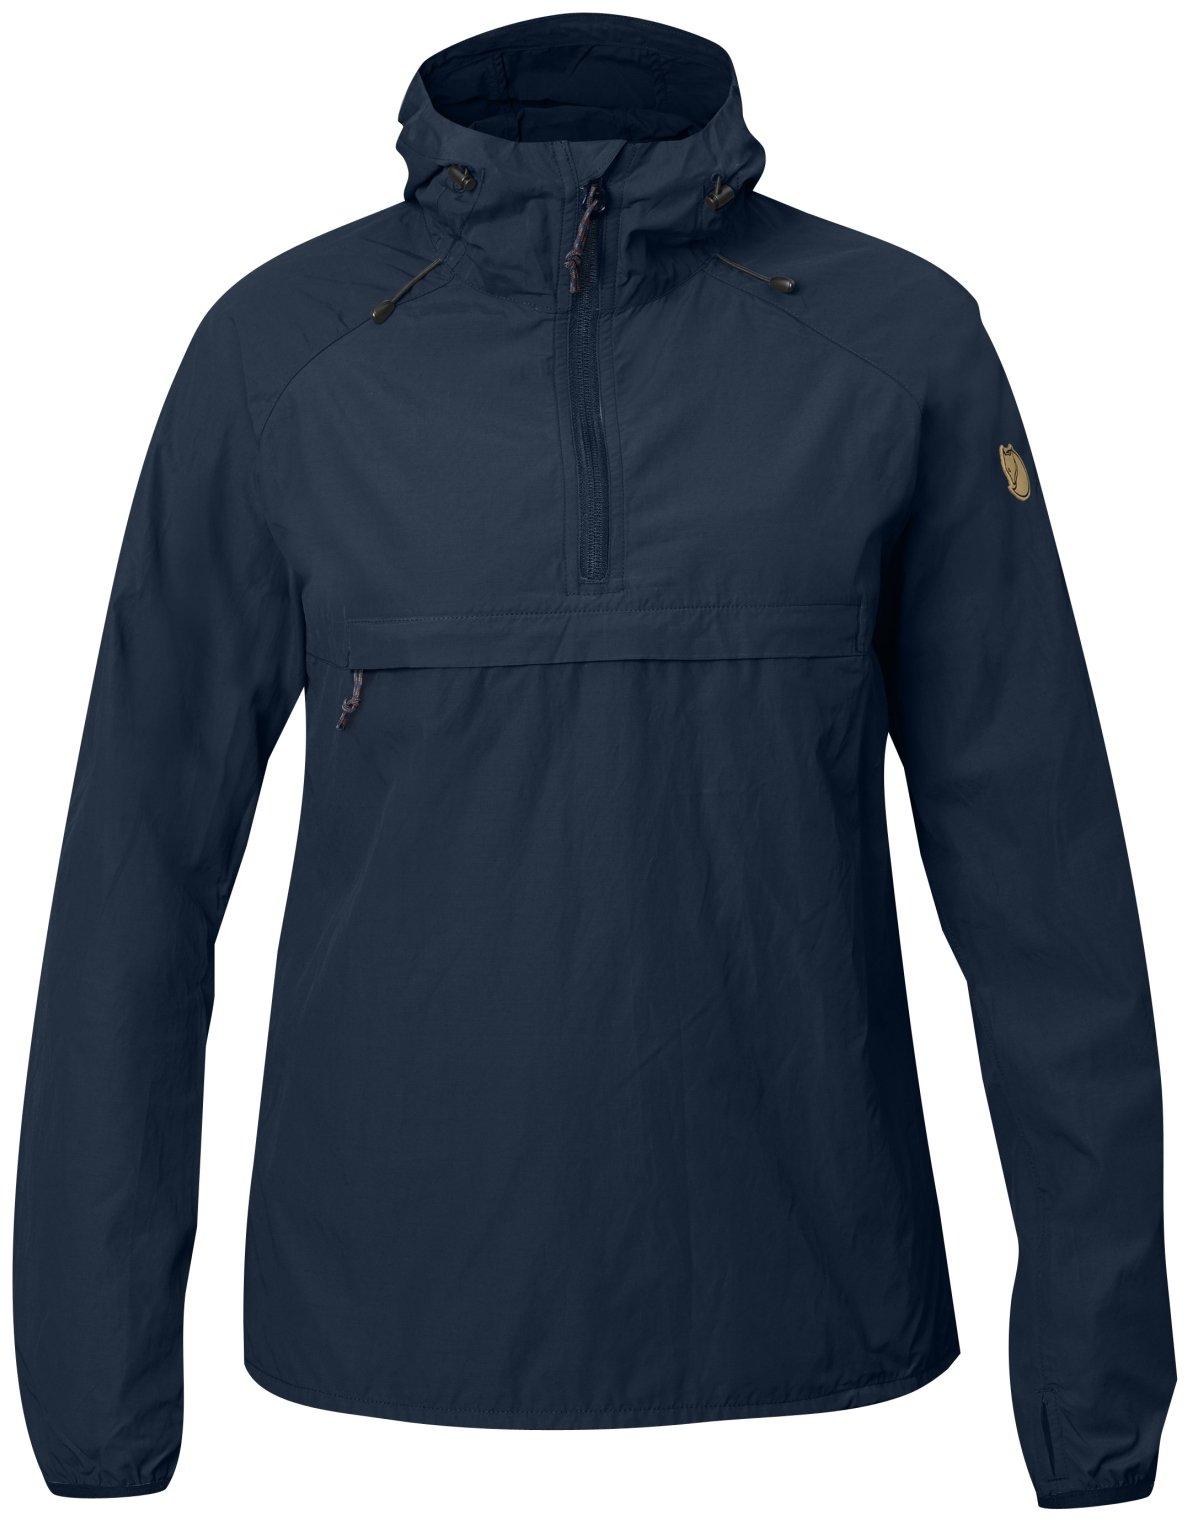 Fjallraven Women's High Coast Wind Anorak Jacket, Navy, 2XS